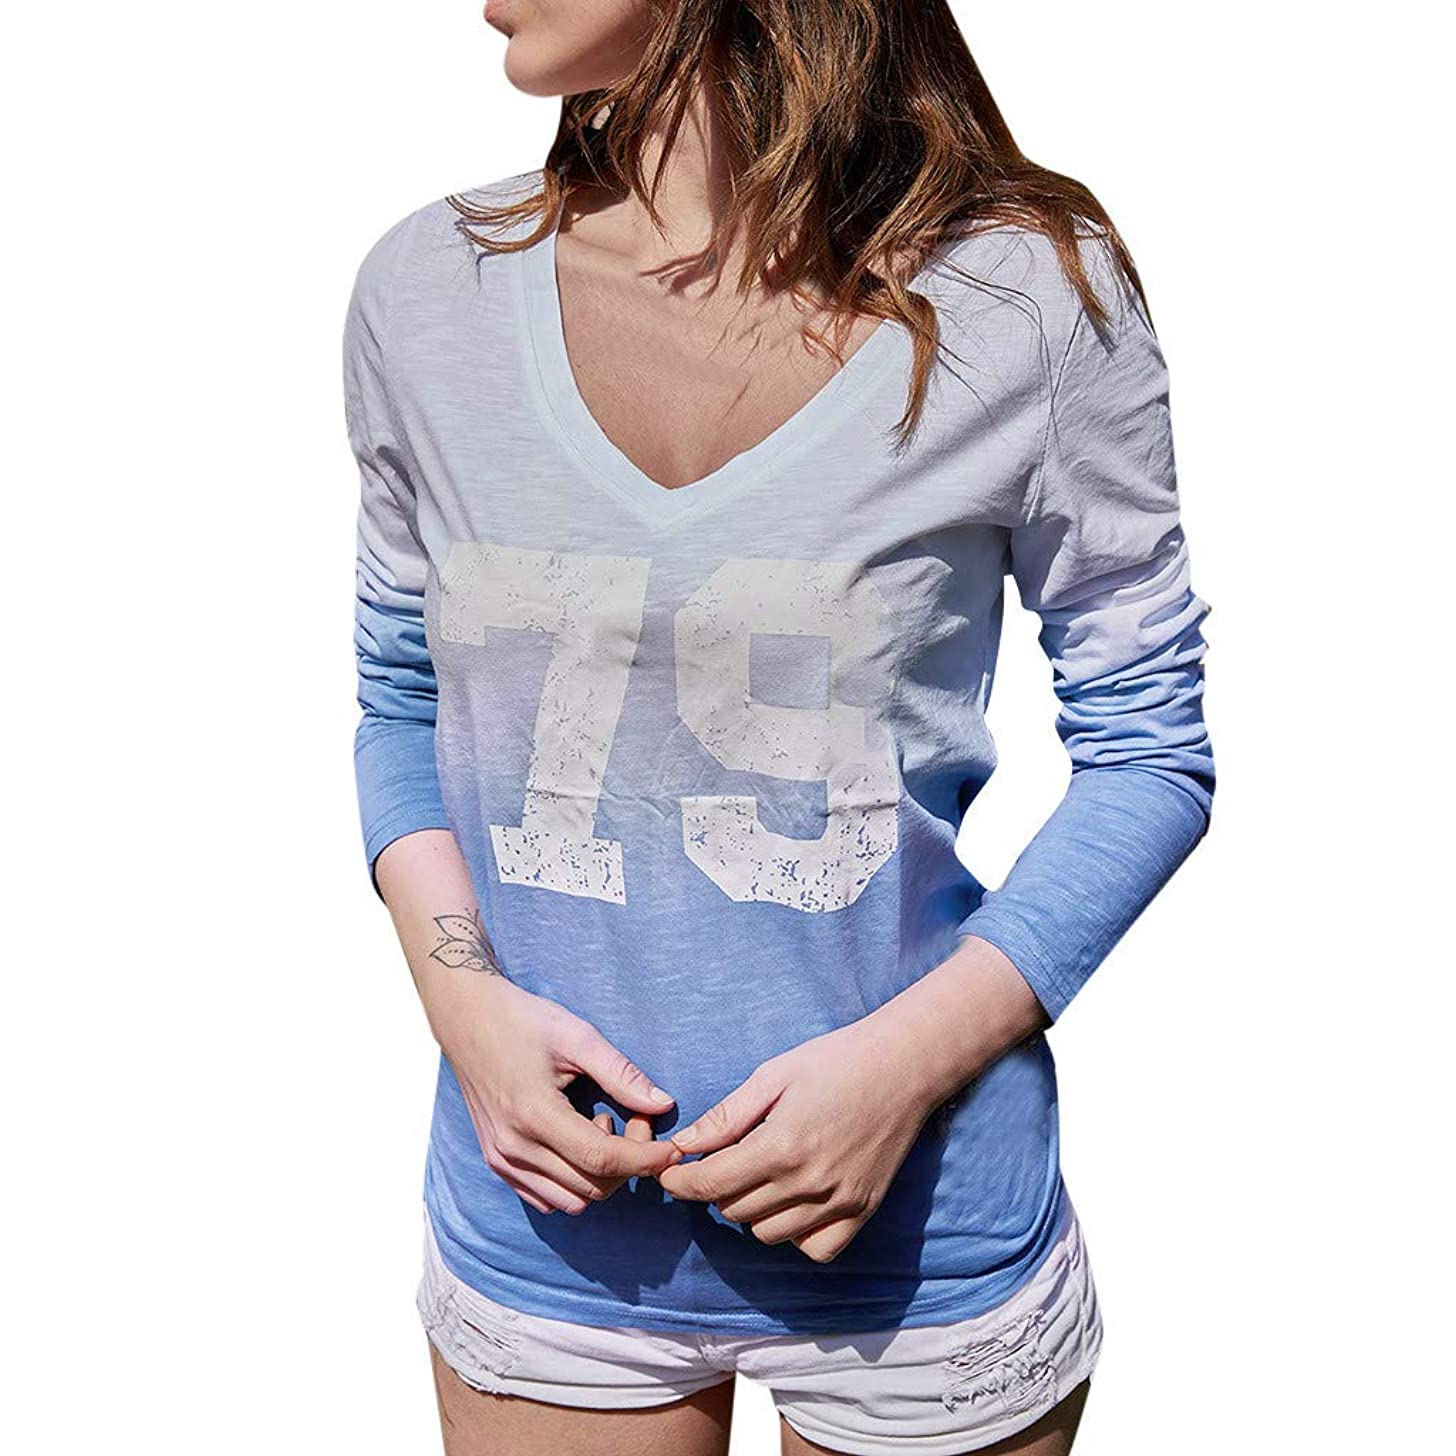 LONGDAY Women T-Shirt Casual Loose Long Sleeve Sweatshirt Tops Blouse Summer Tunic V-Neck Gradient Shirt Print Pullover